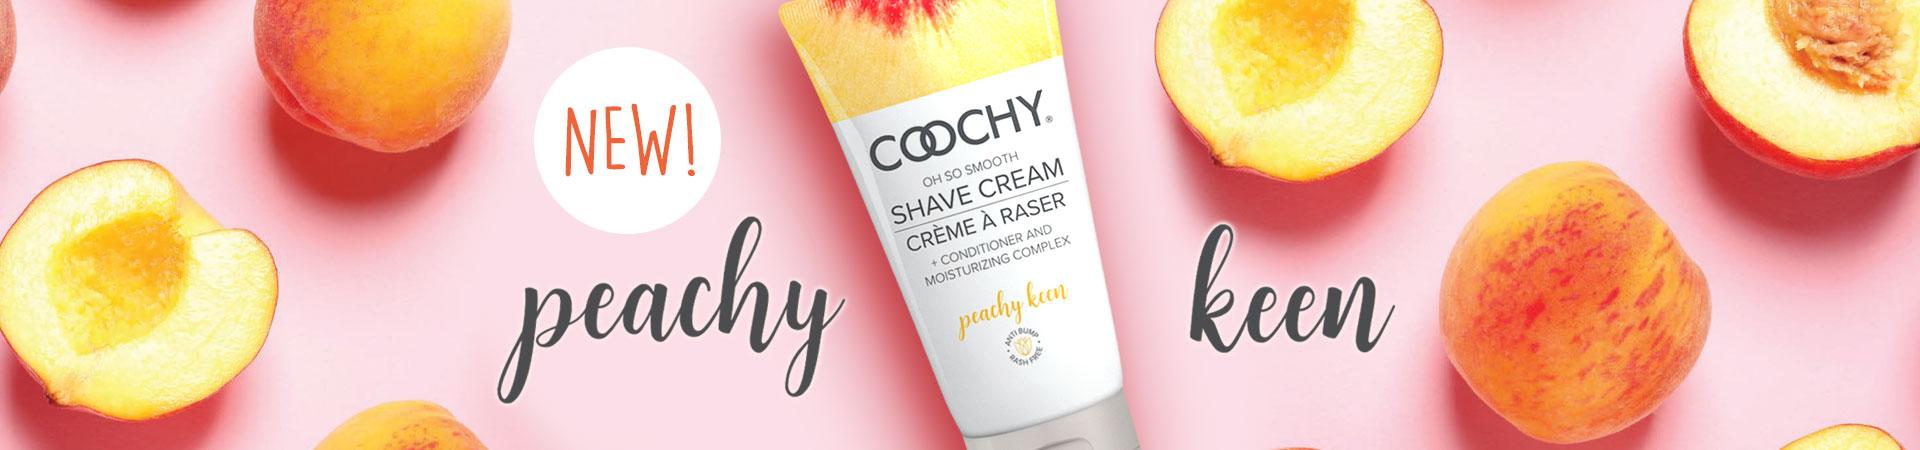 New Peachy Keen Coochy Cream!